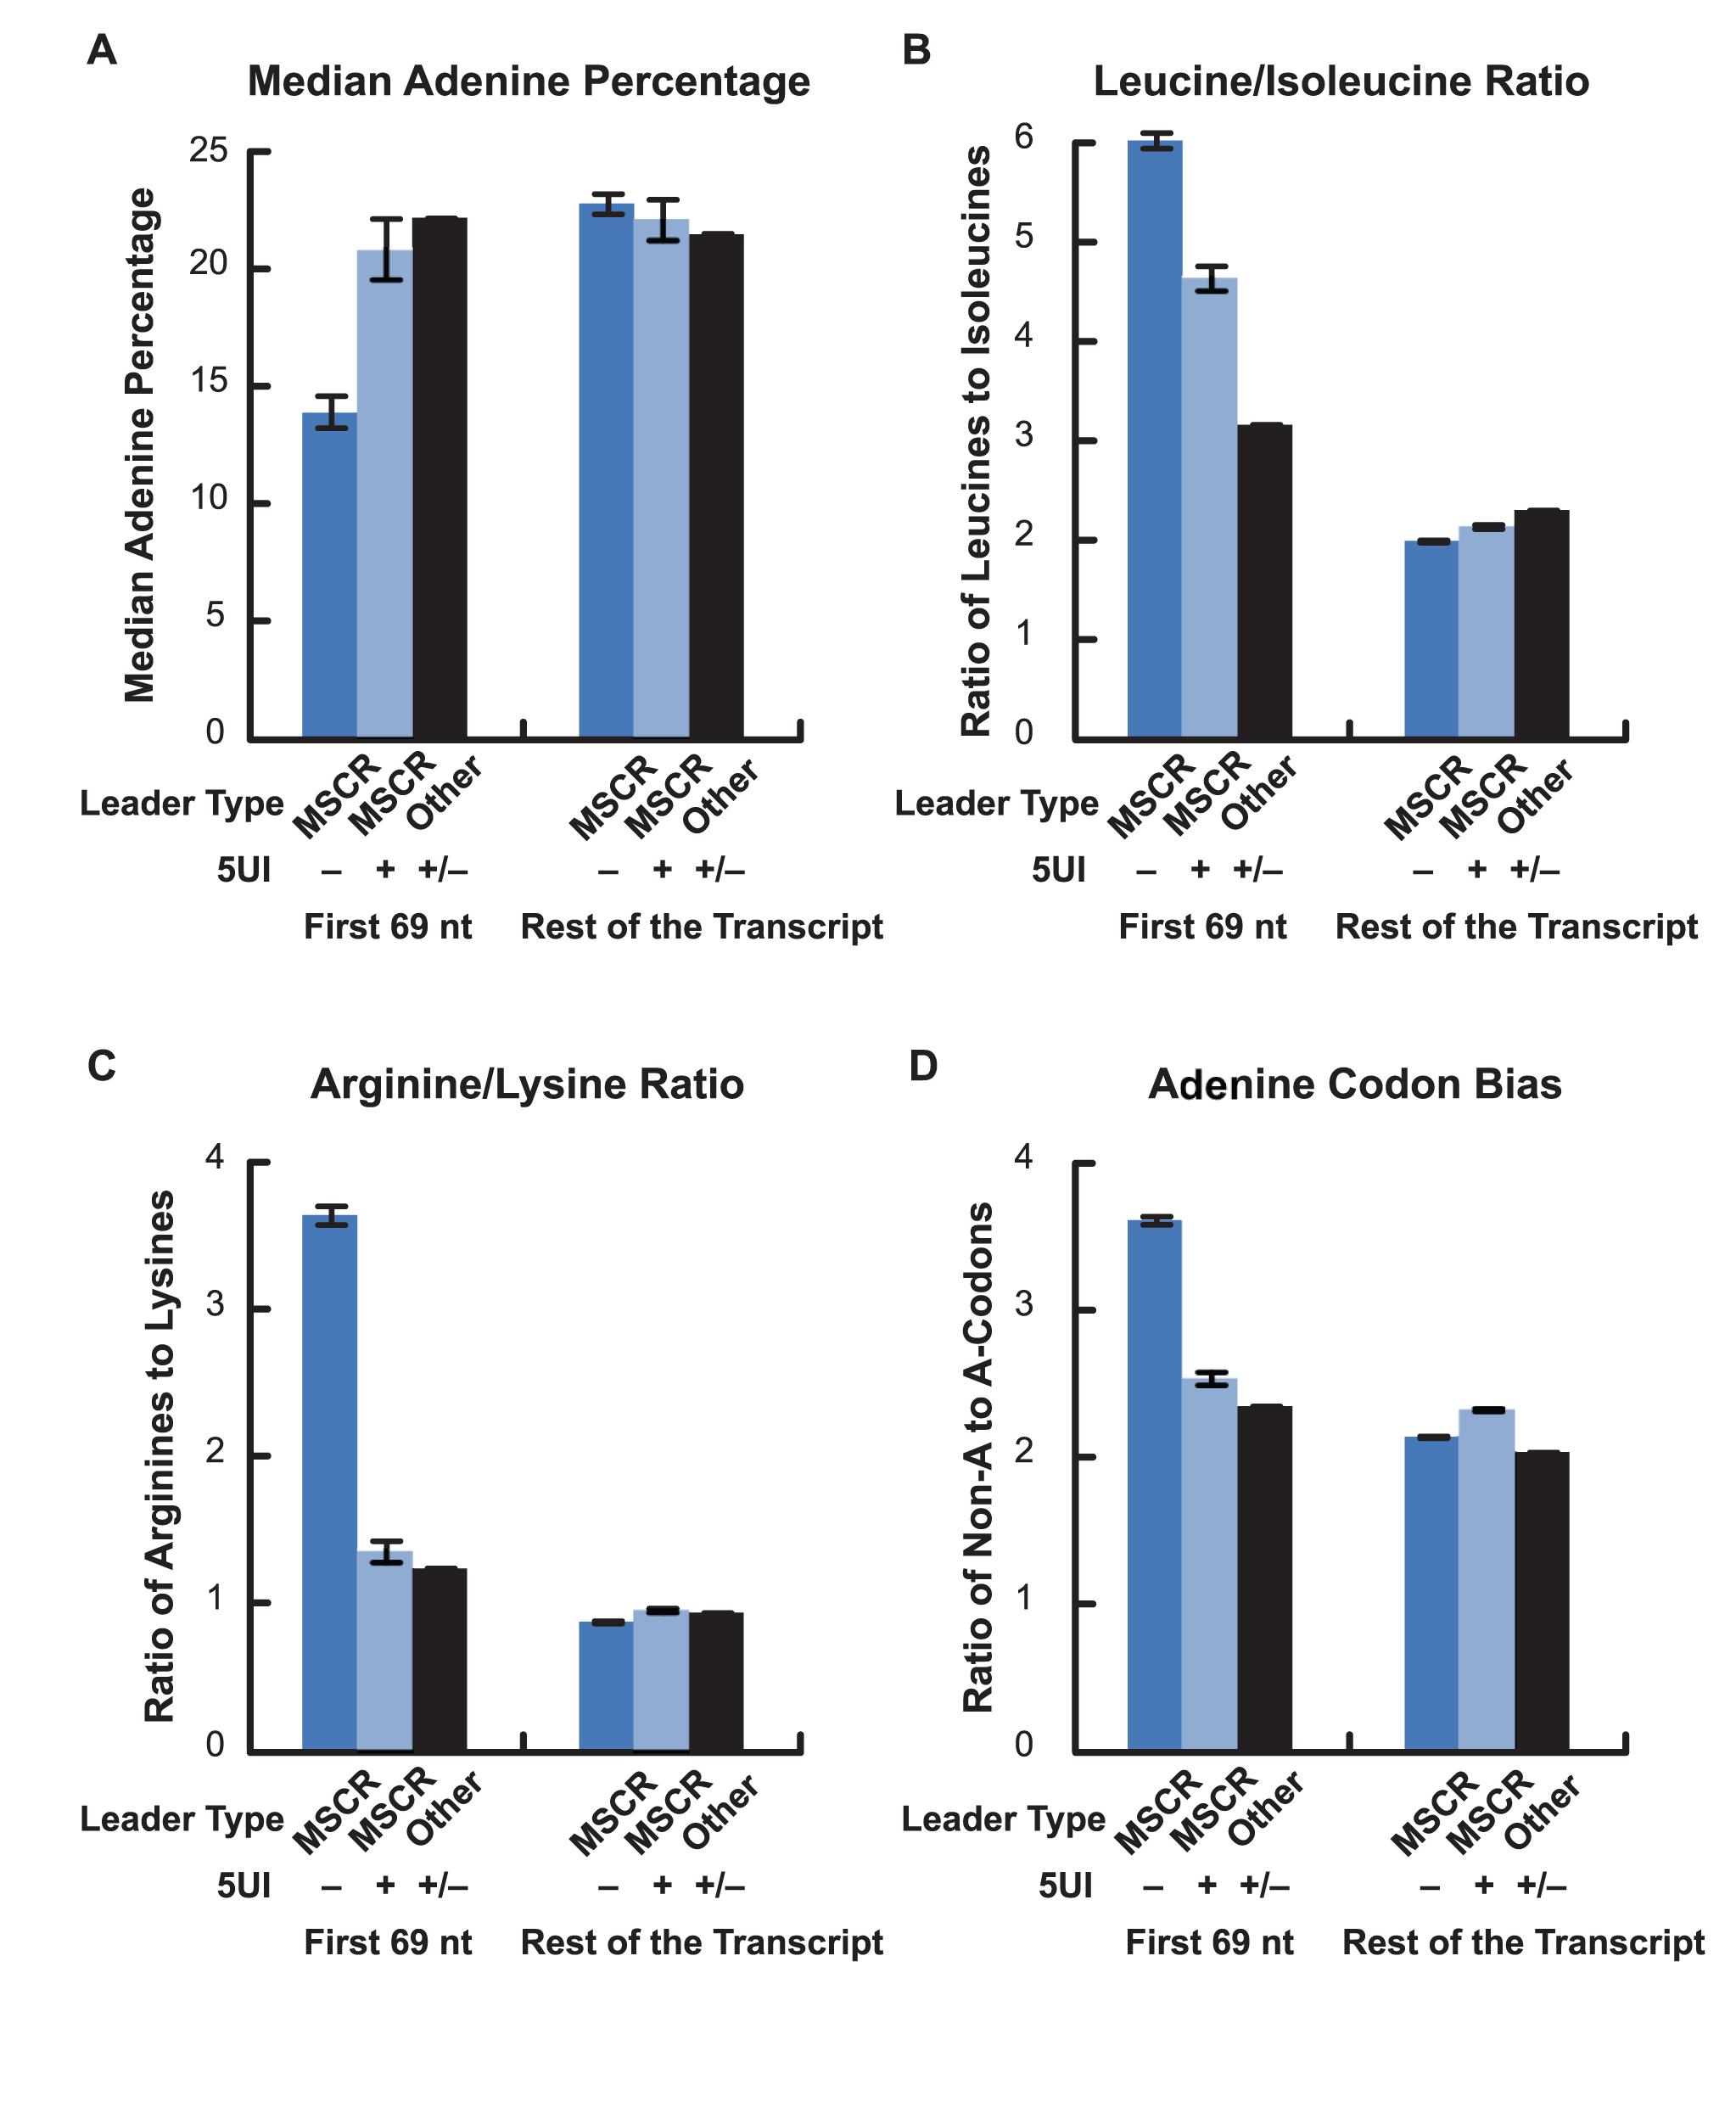 Adenine depletion in MSCRs derived from 5UI<sup>−</sup> genes.